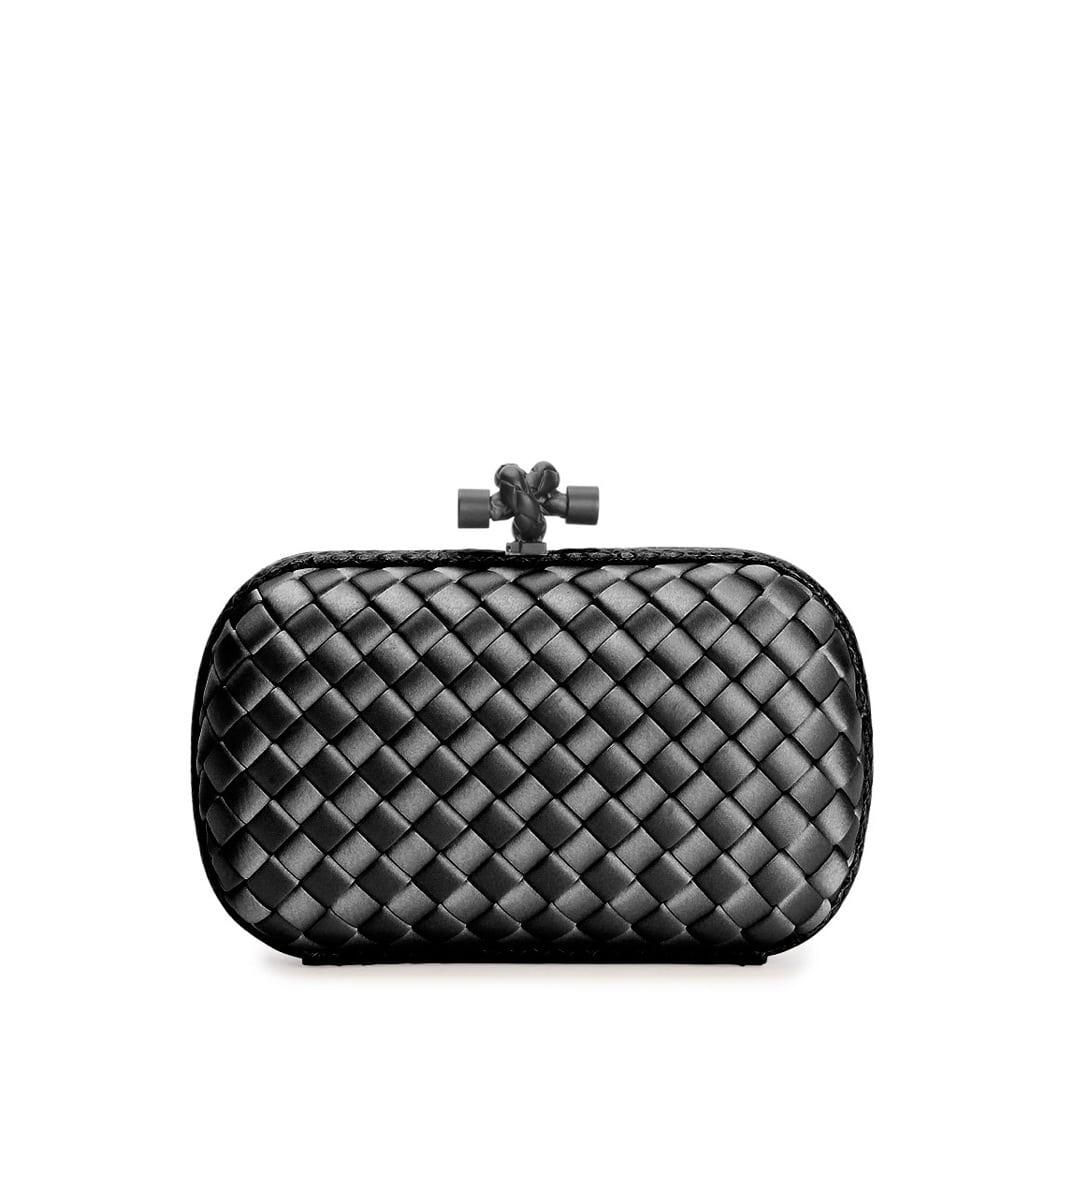 bottega veneta cruise 2015 bag collection and new glimmer hobo spotted fashion. Black Bedroom Furniture Sets. Home Design Ideas